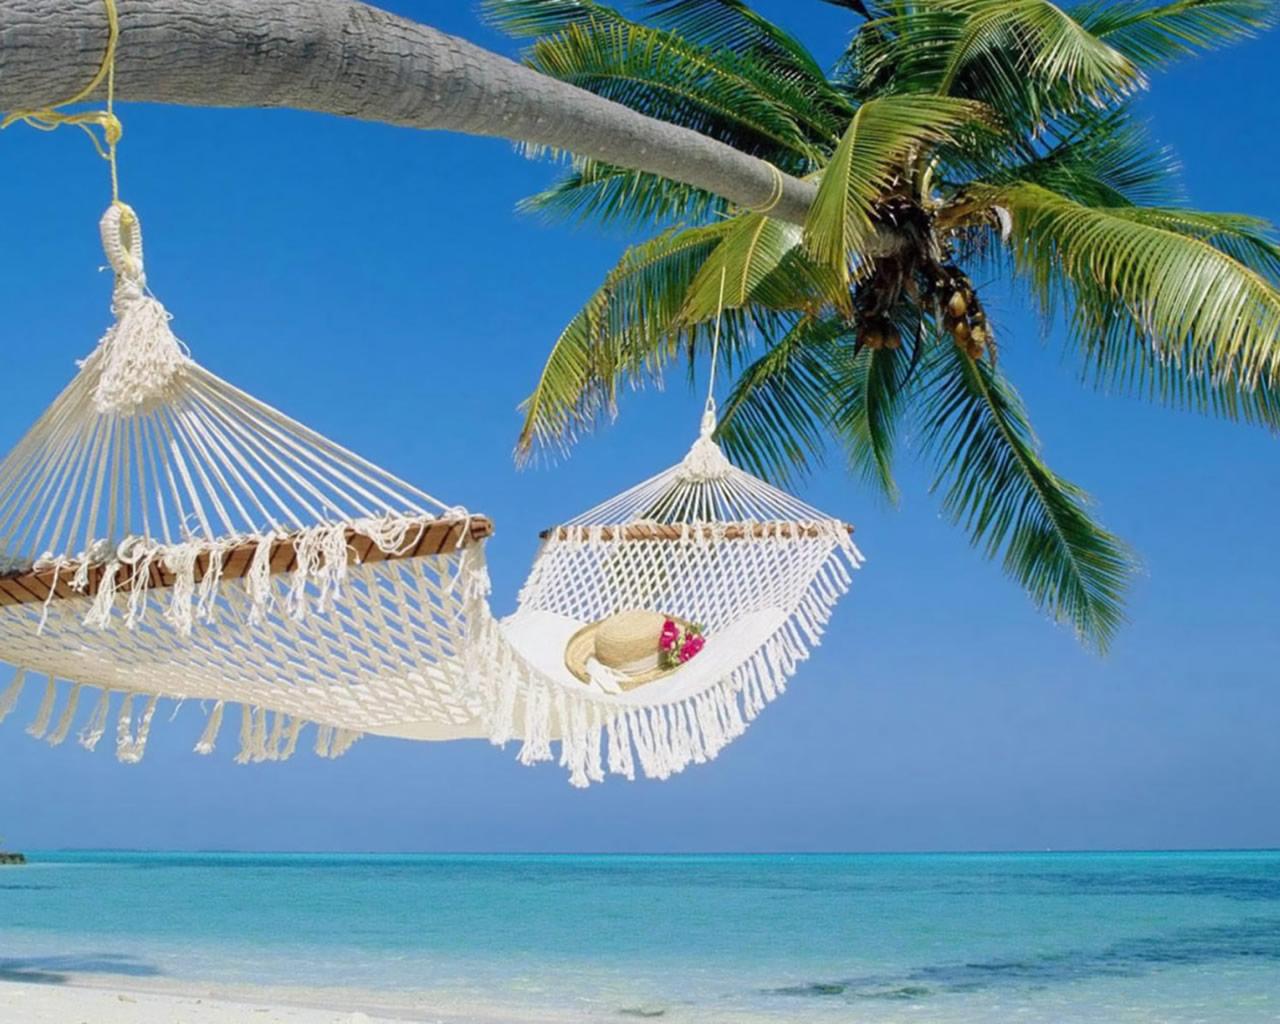 Holiday dreams: A day at the beach